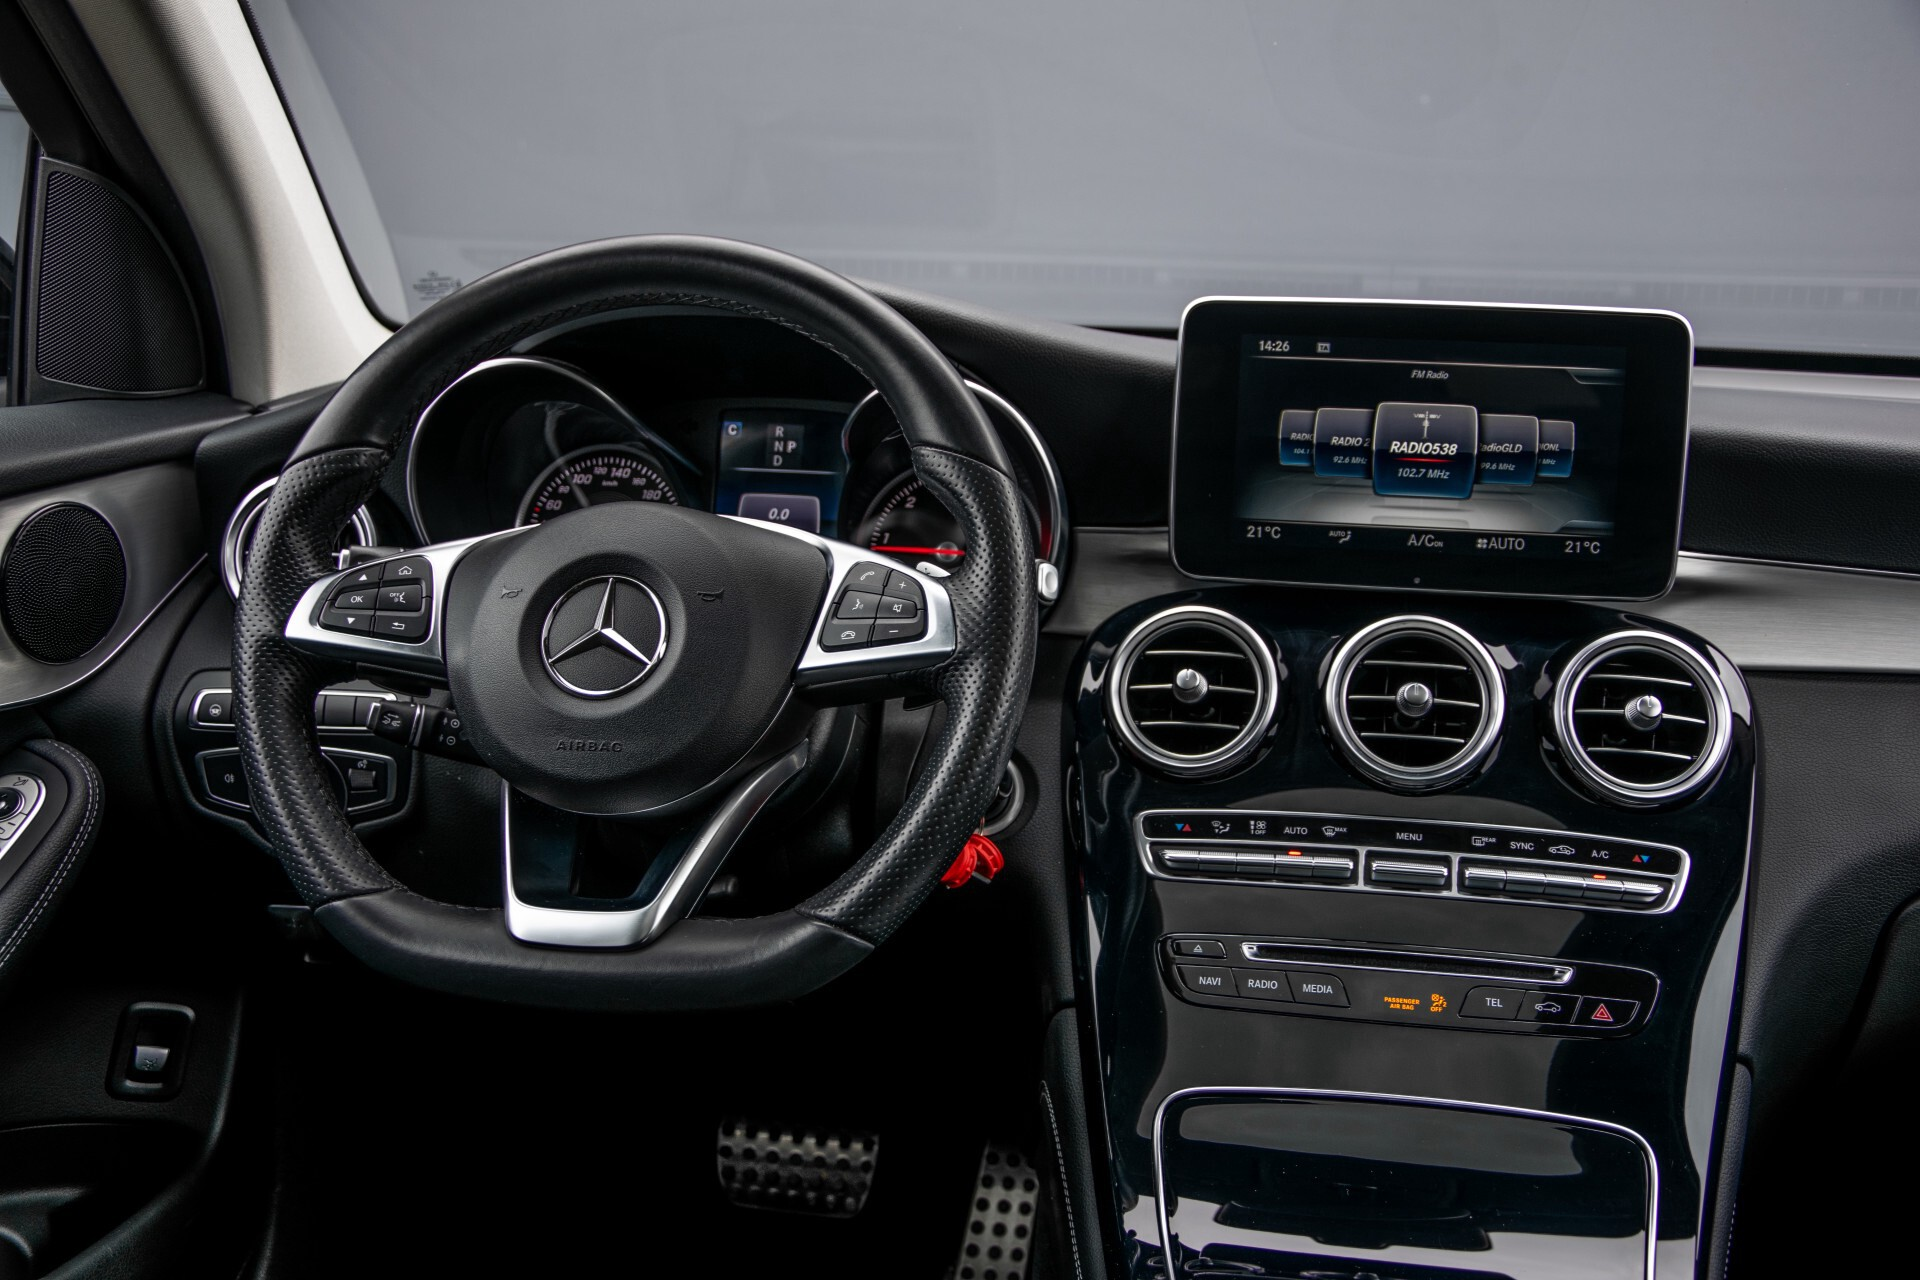 Mercedes-Benz GLC 220 d 4-M AMG/Distronic/Panorama/Comand/HUD/Afn-Trhk Aut9 Foto 6